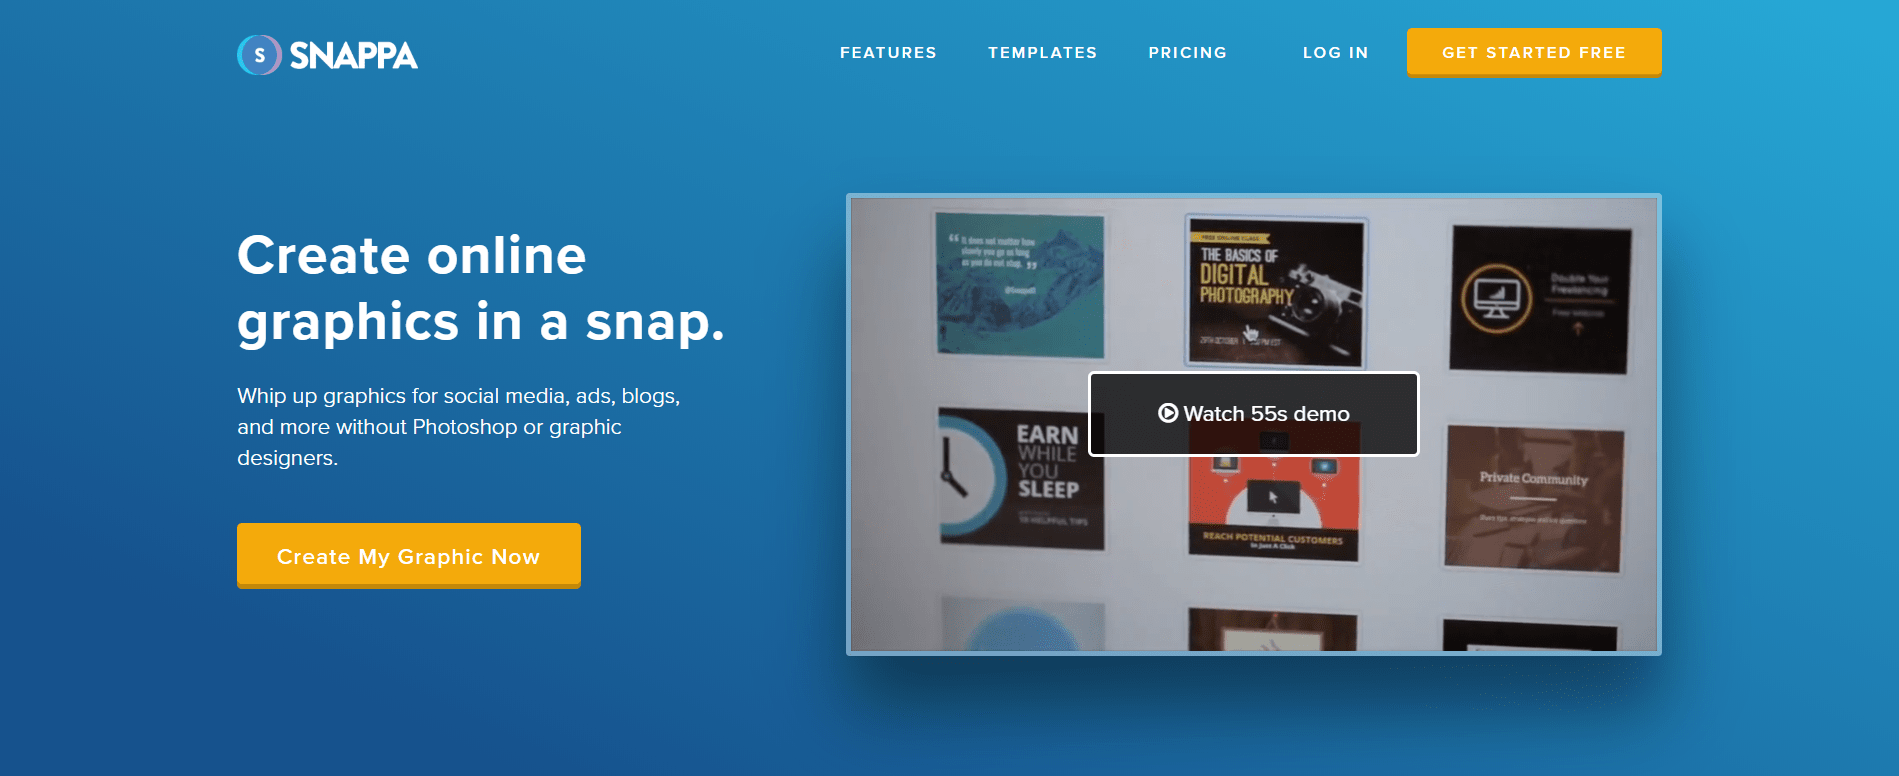 Snappa Landing Page